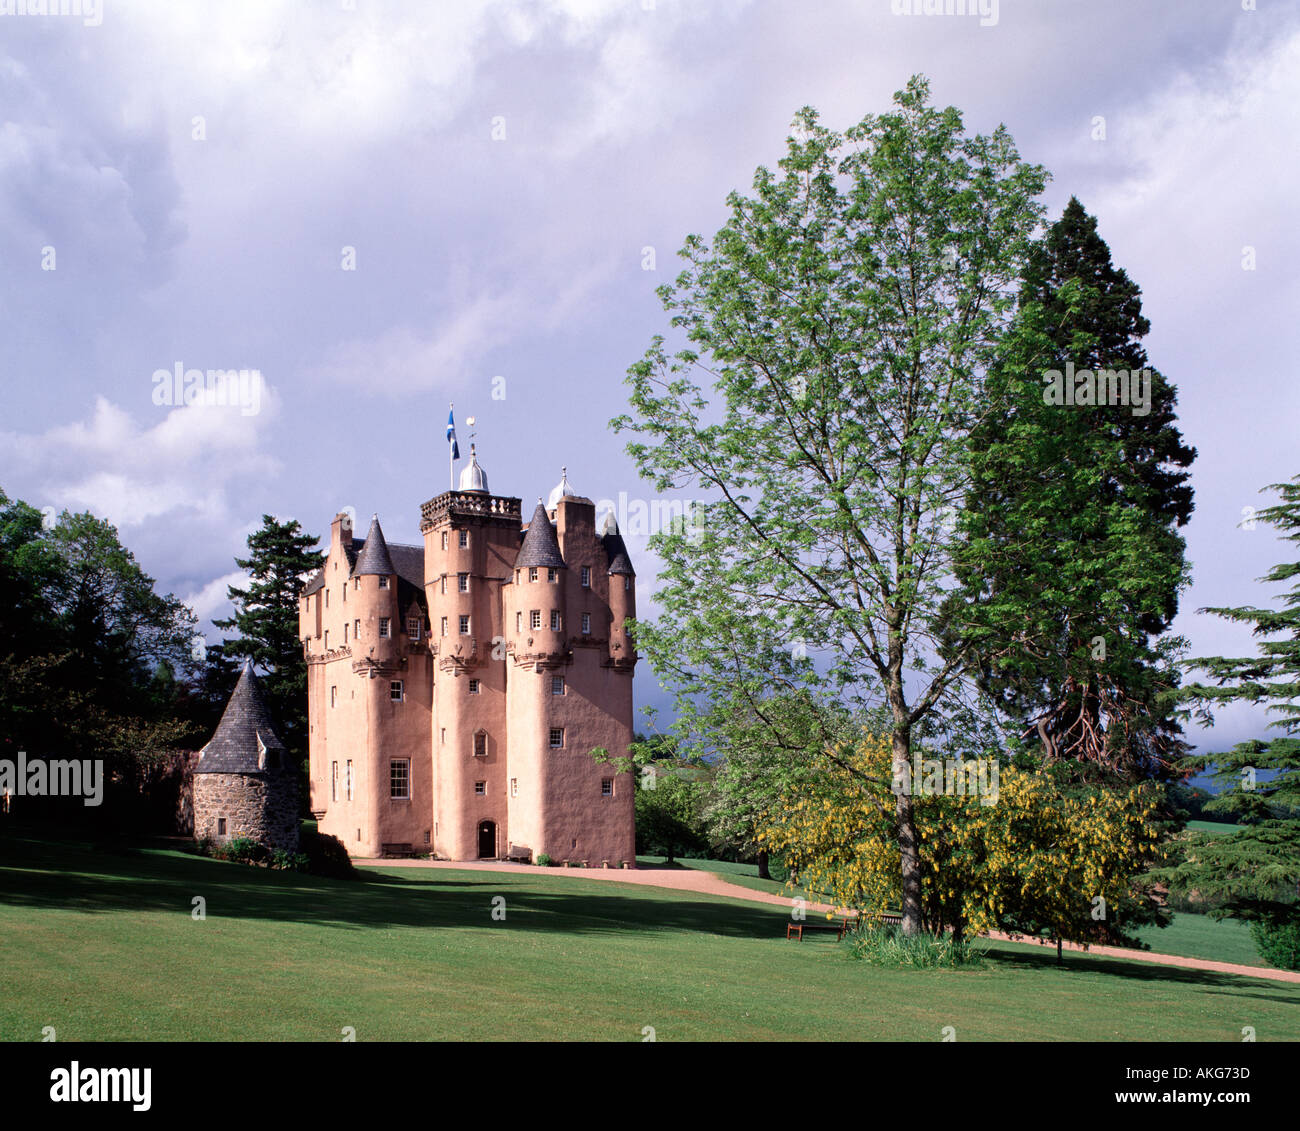 Craigievar Castle, Grampian Region, Scotland, UK - Stock Image